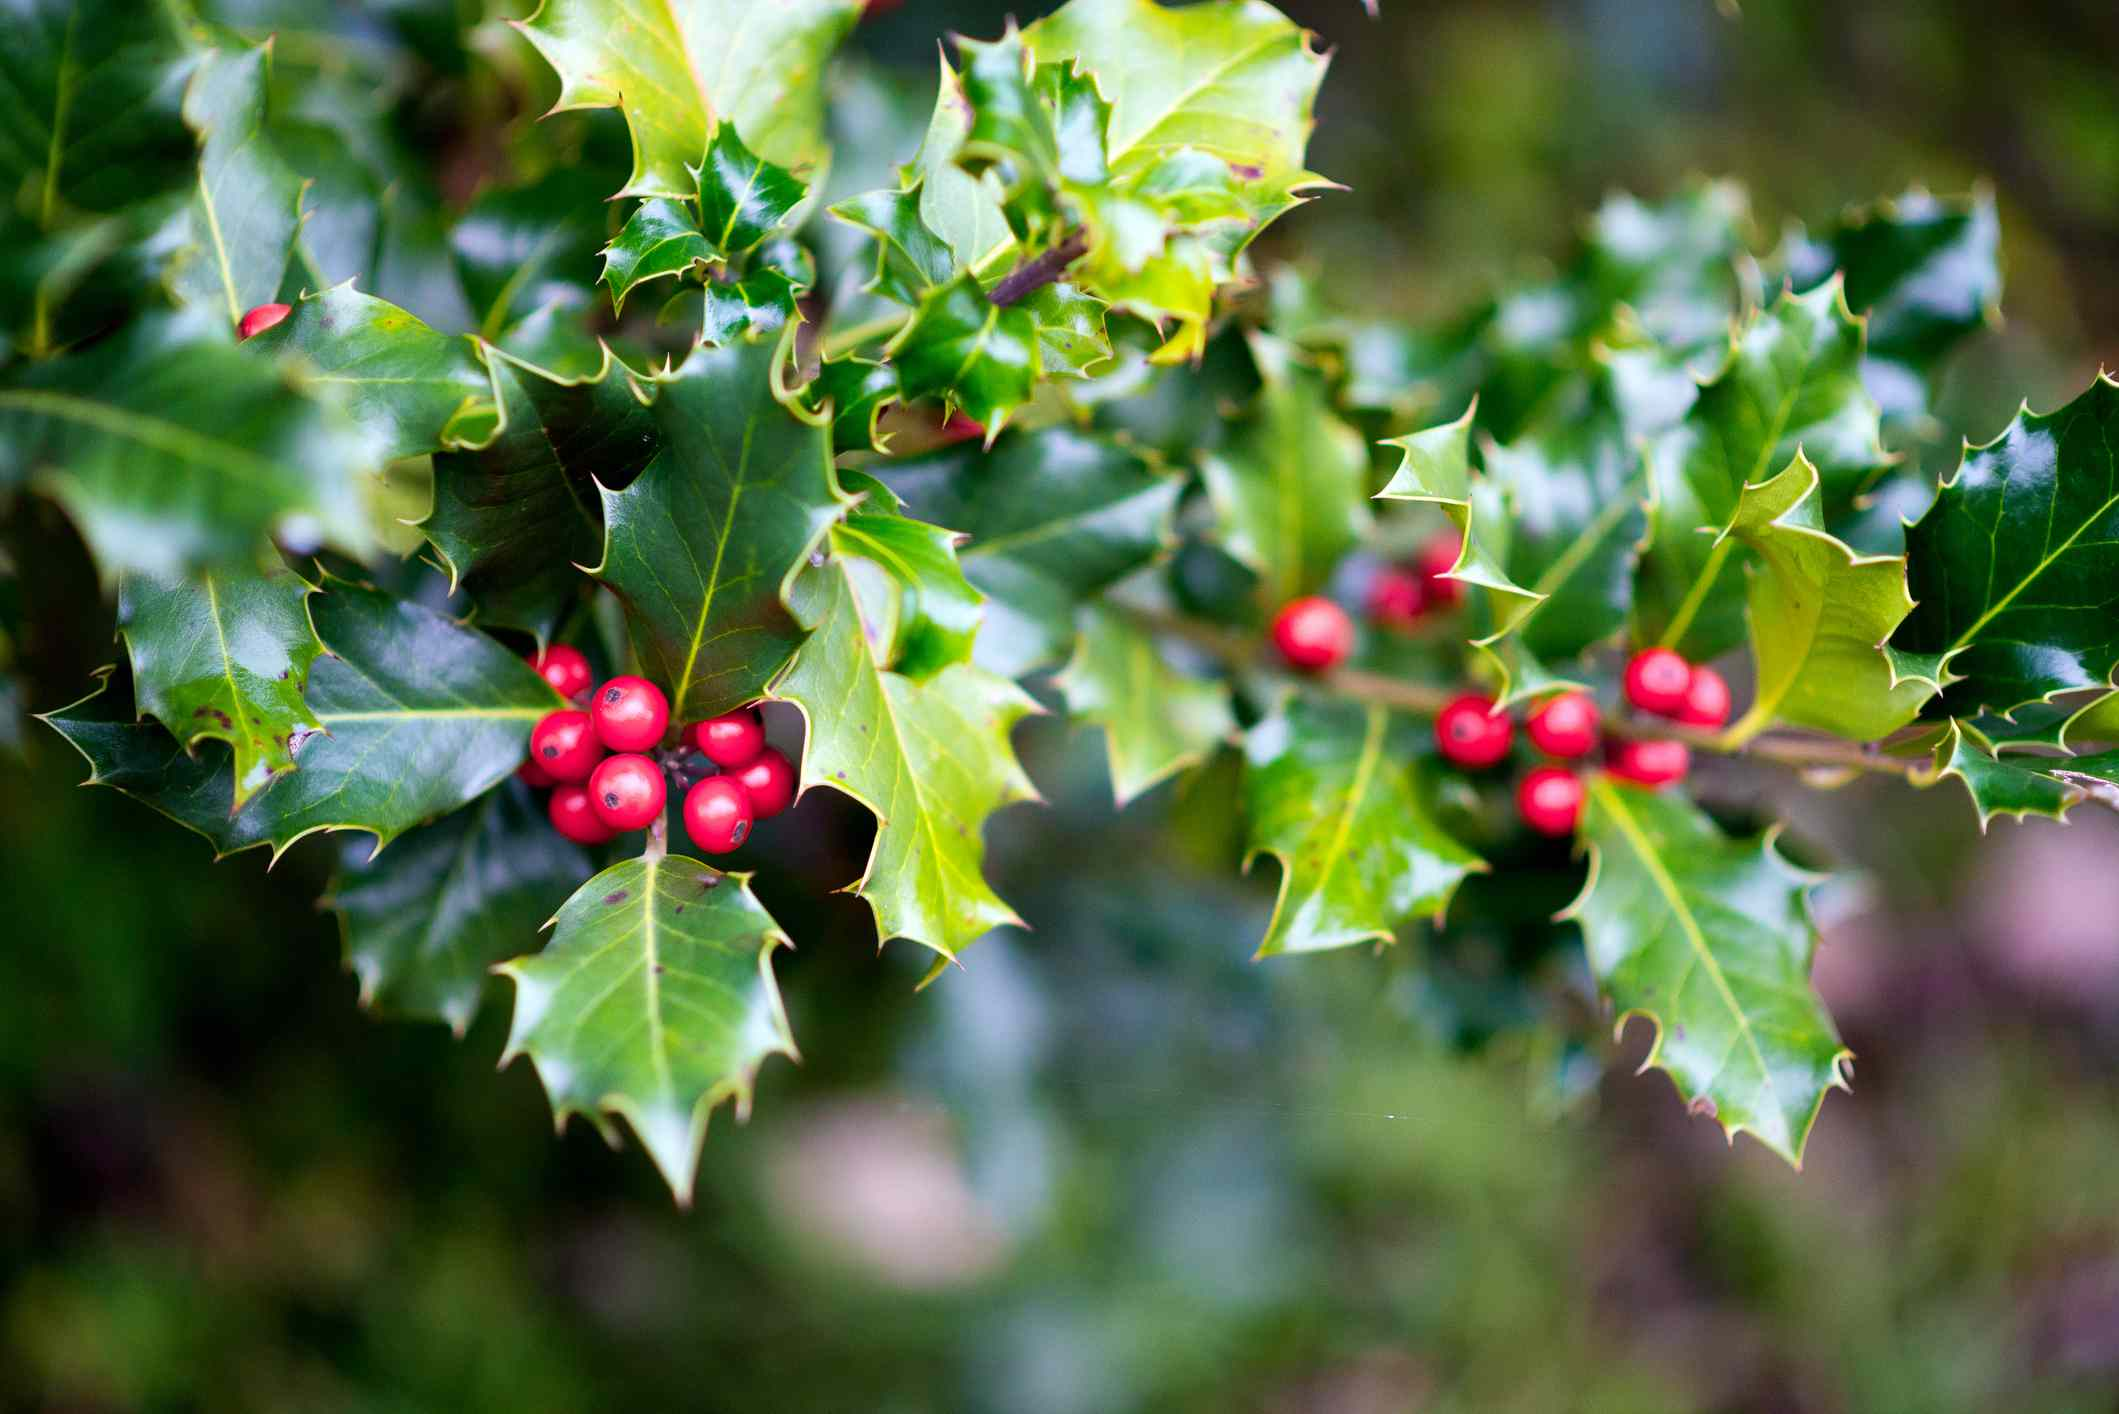 Ilex aquifolium (holly, English holly, European holly, Christmas holly)